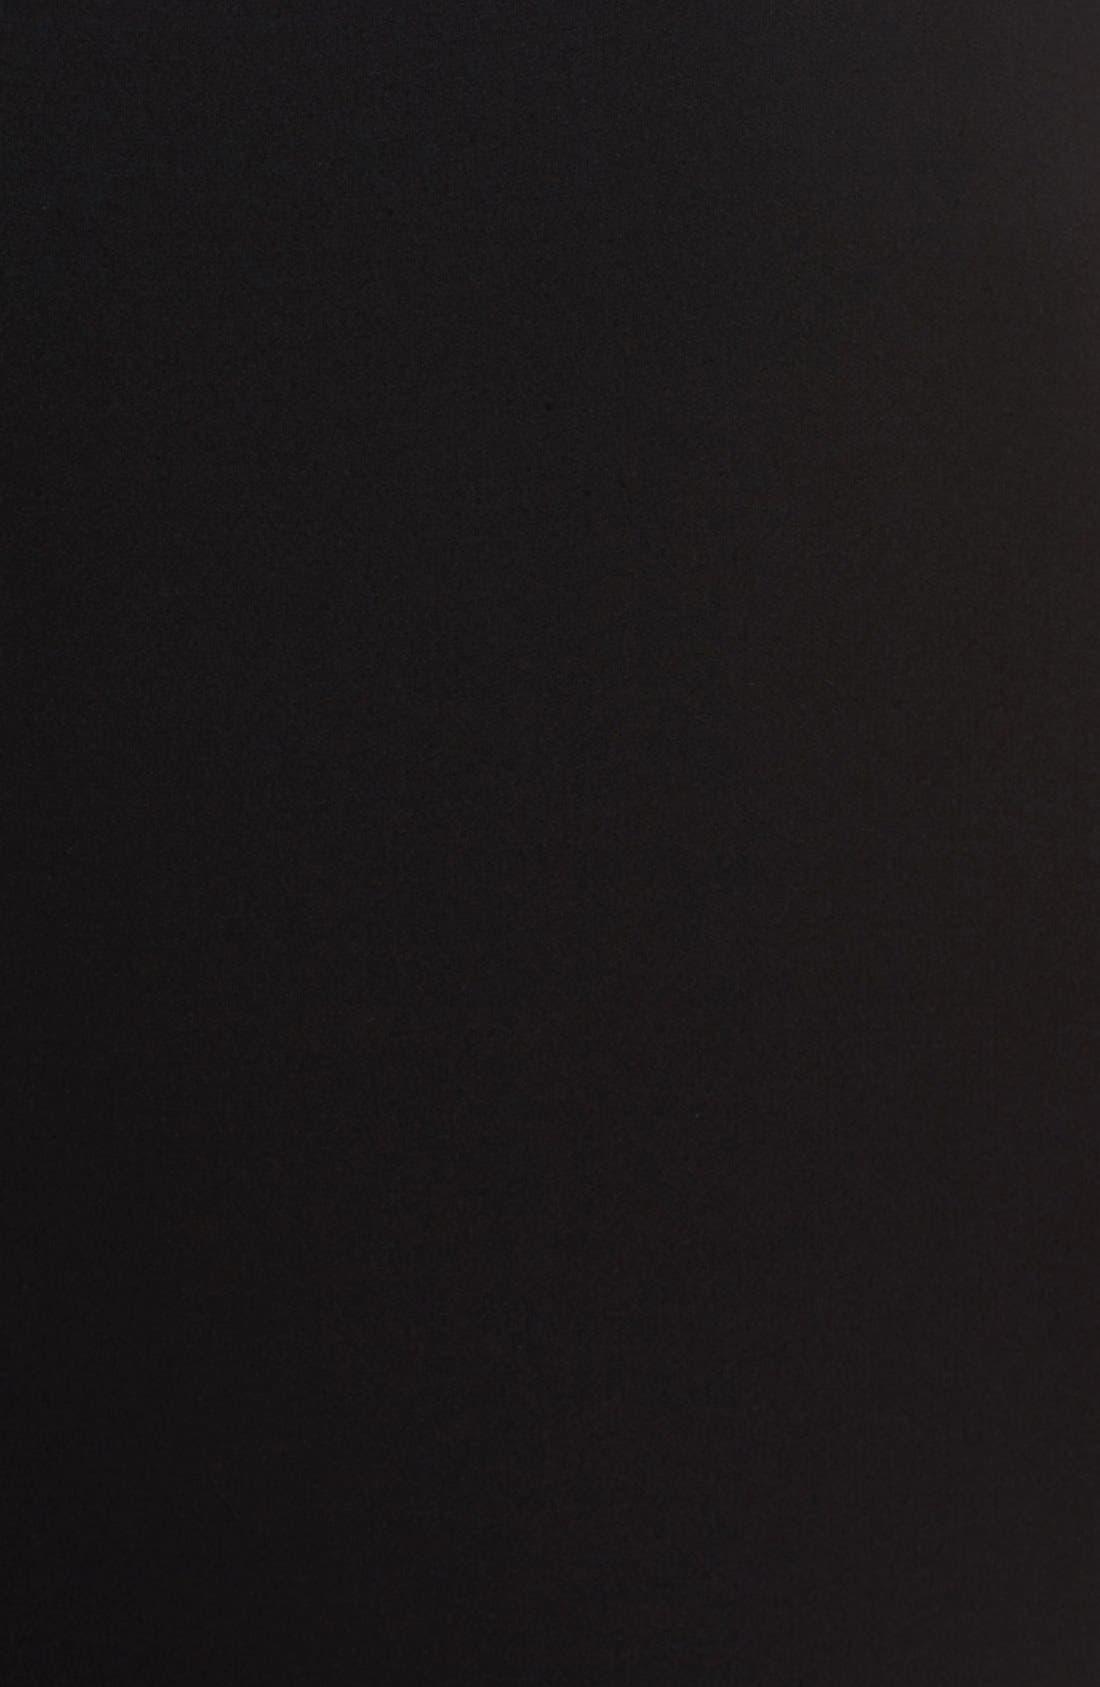 Silk Crepe Bateau Neck Shell,                             Alternate thumbnail 7, color,                             BLACK